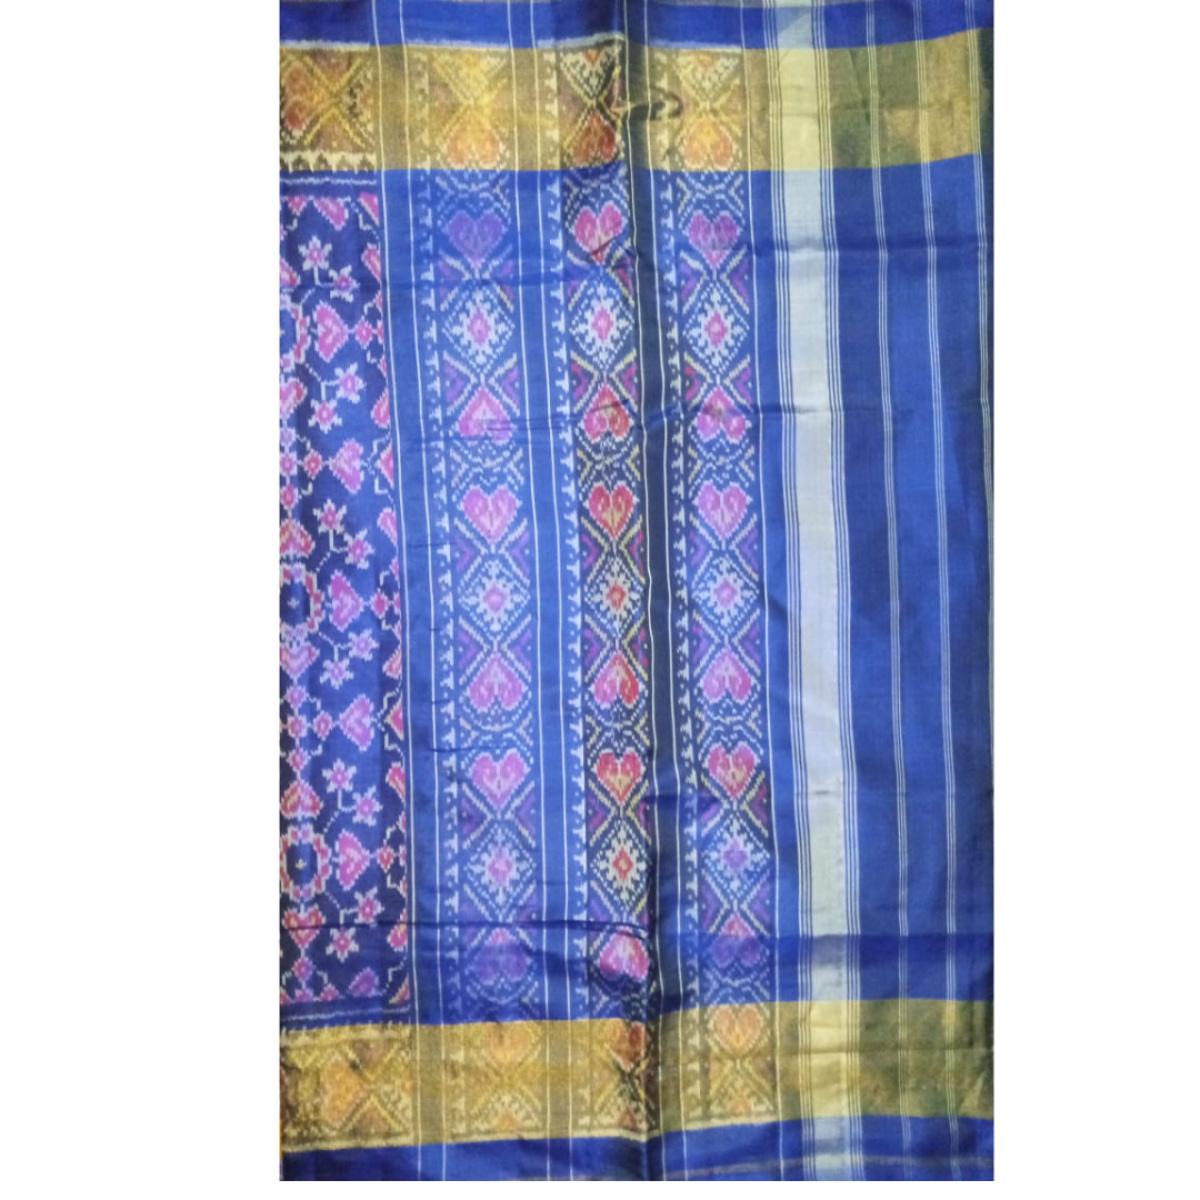 Handmade Handwoven Patan Patola Silk Saree blue with golden border 3